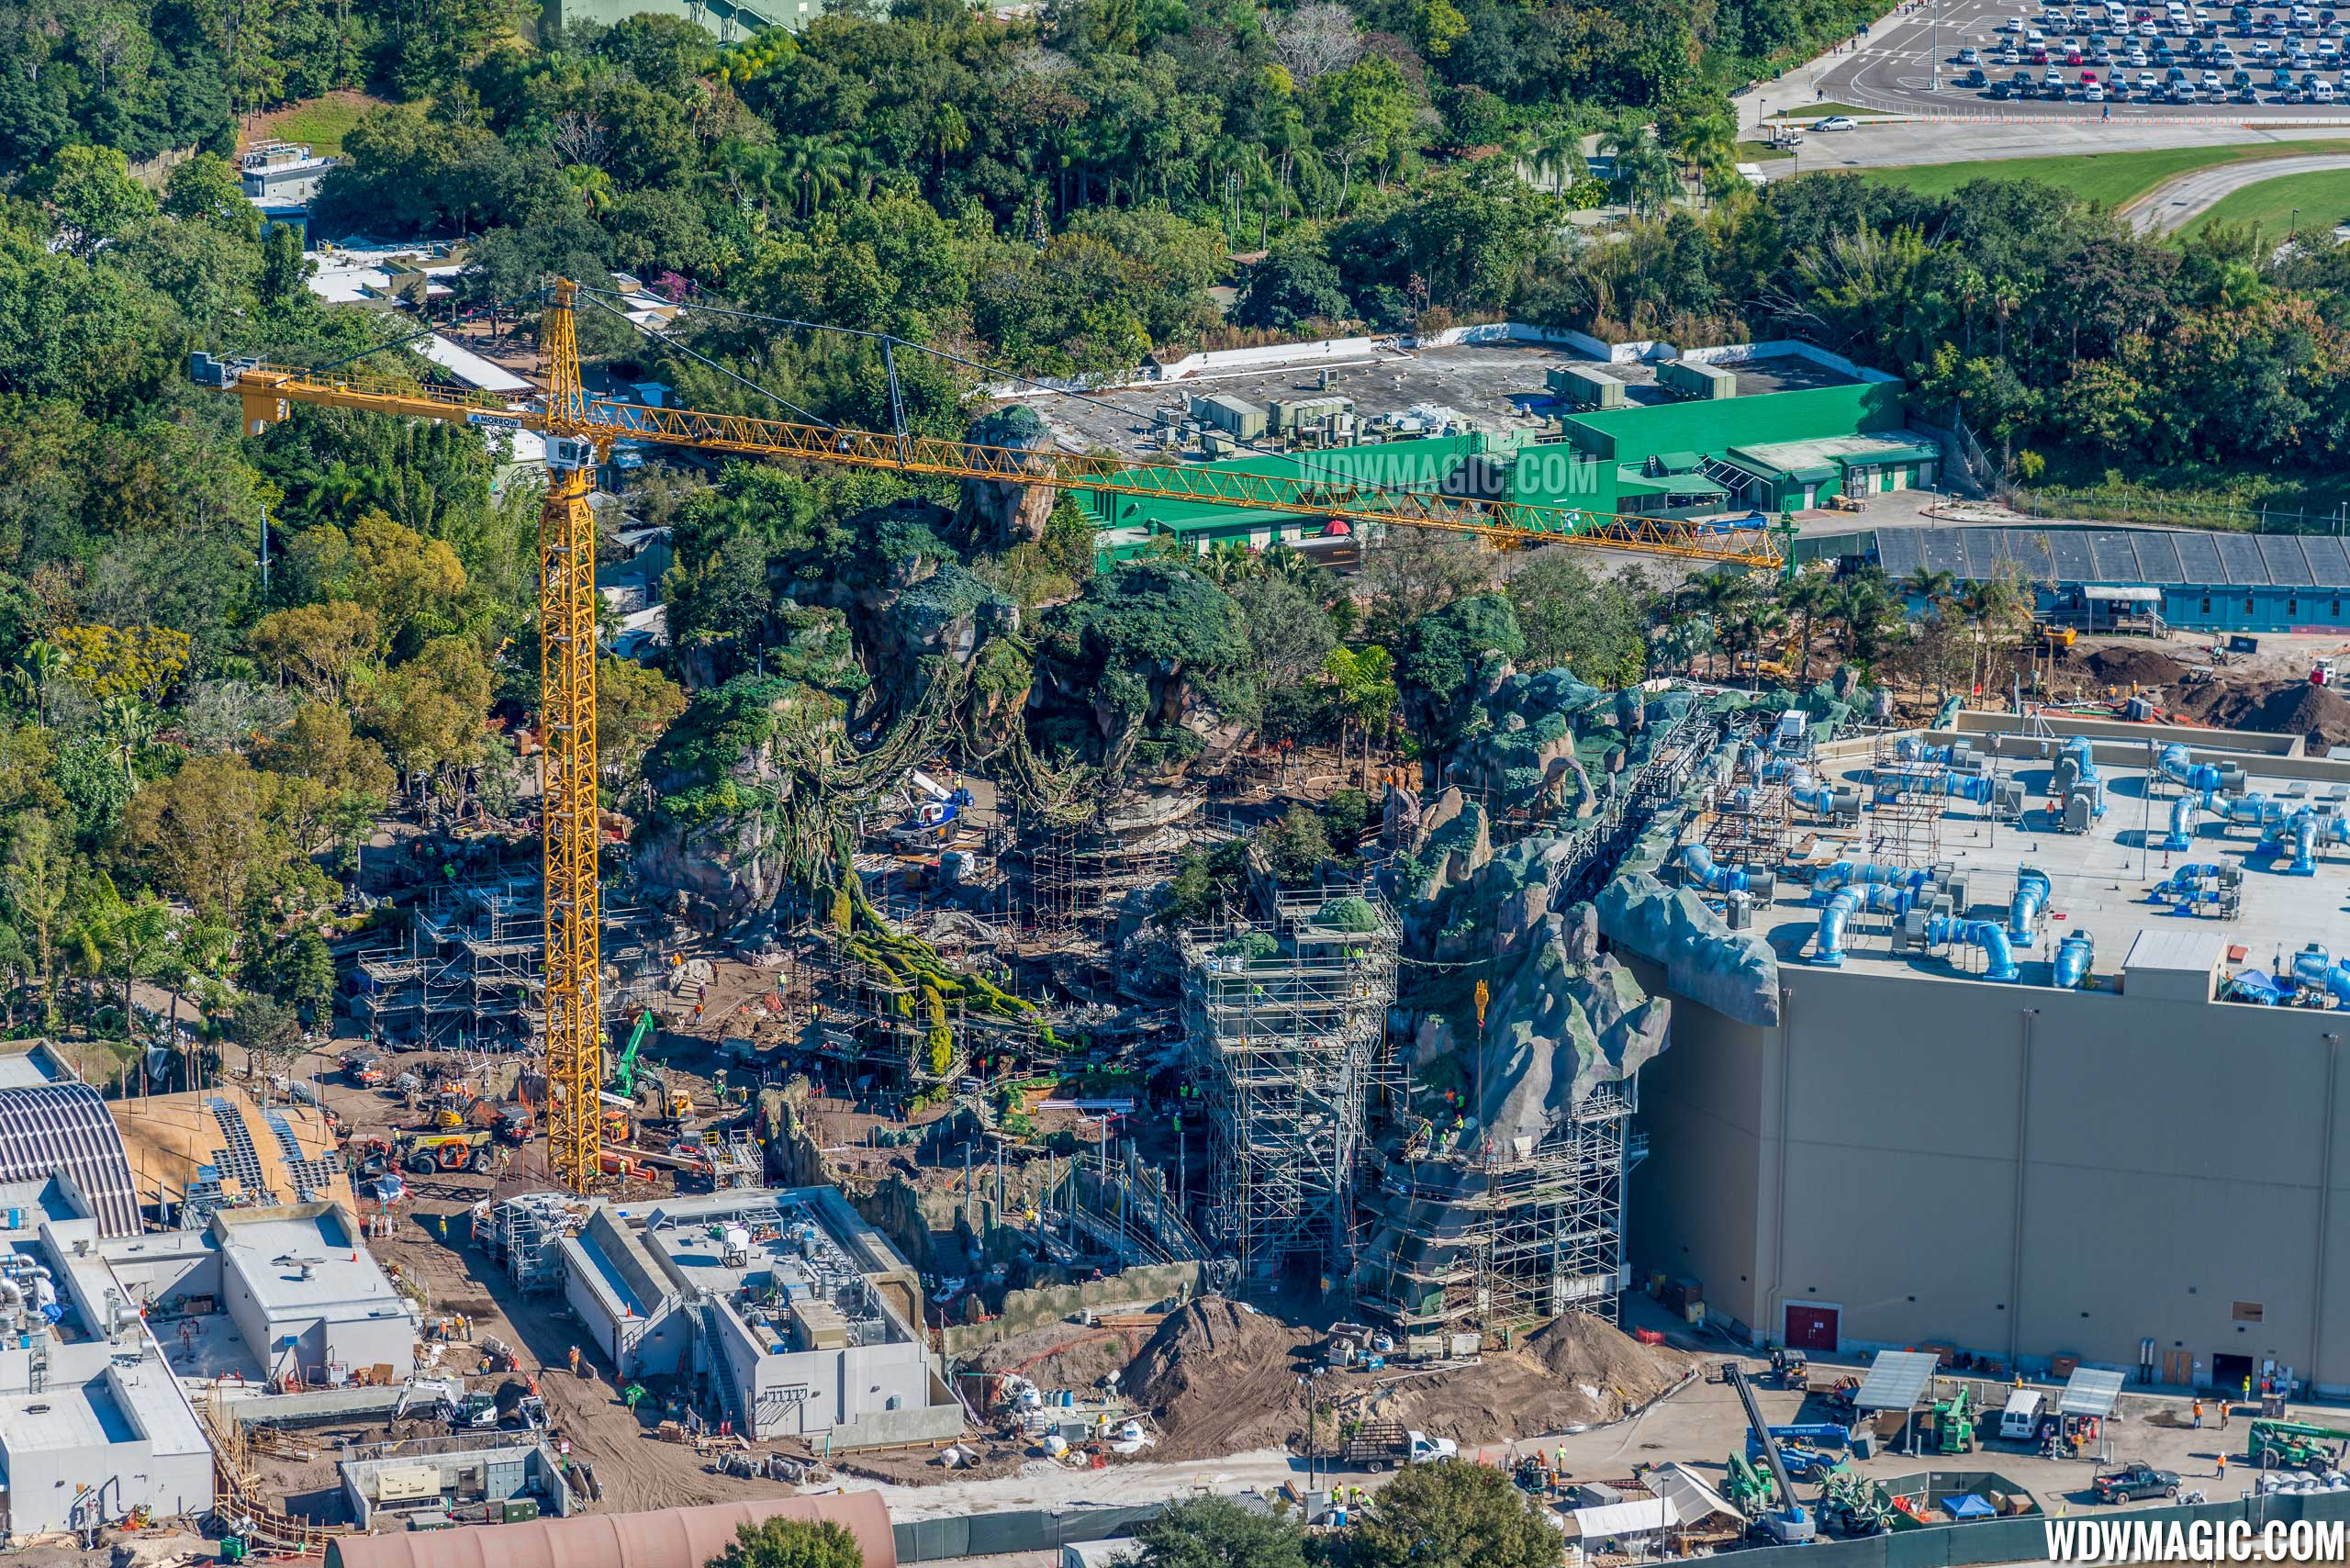 Aerial views of 'Pandora - The World of Avatar' under construction